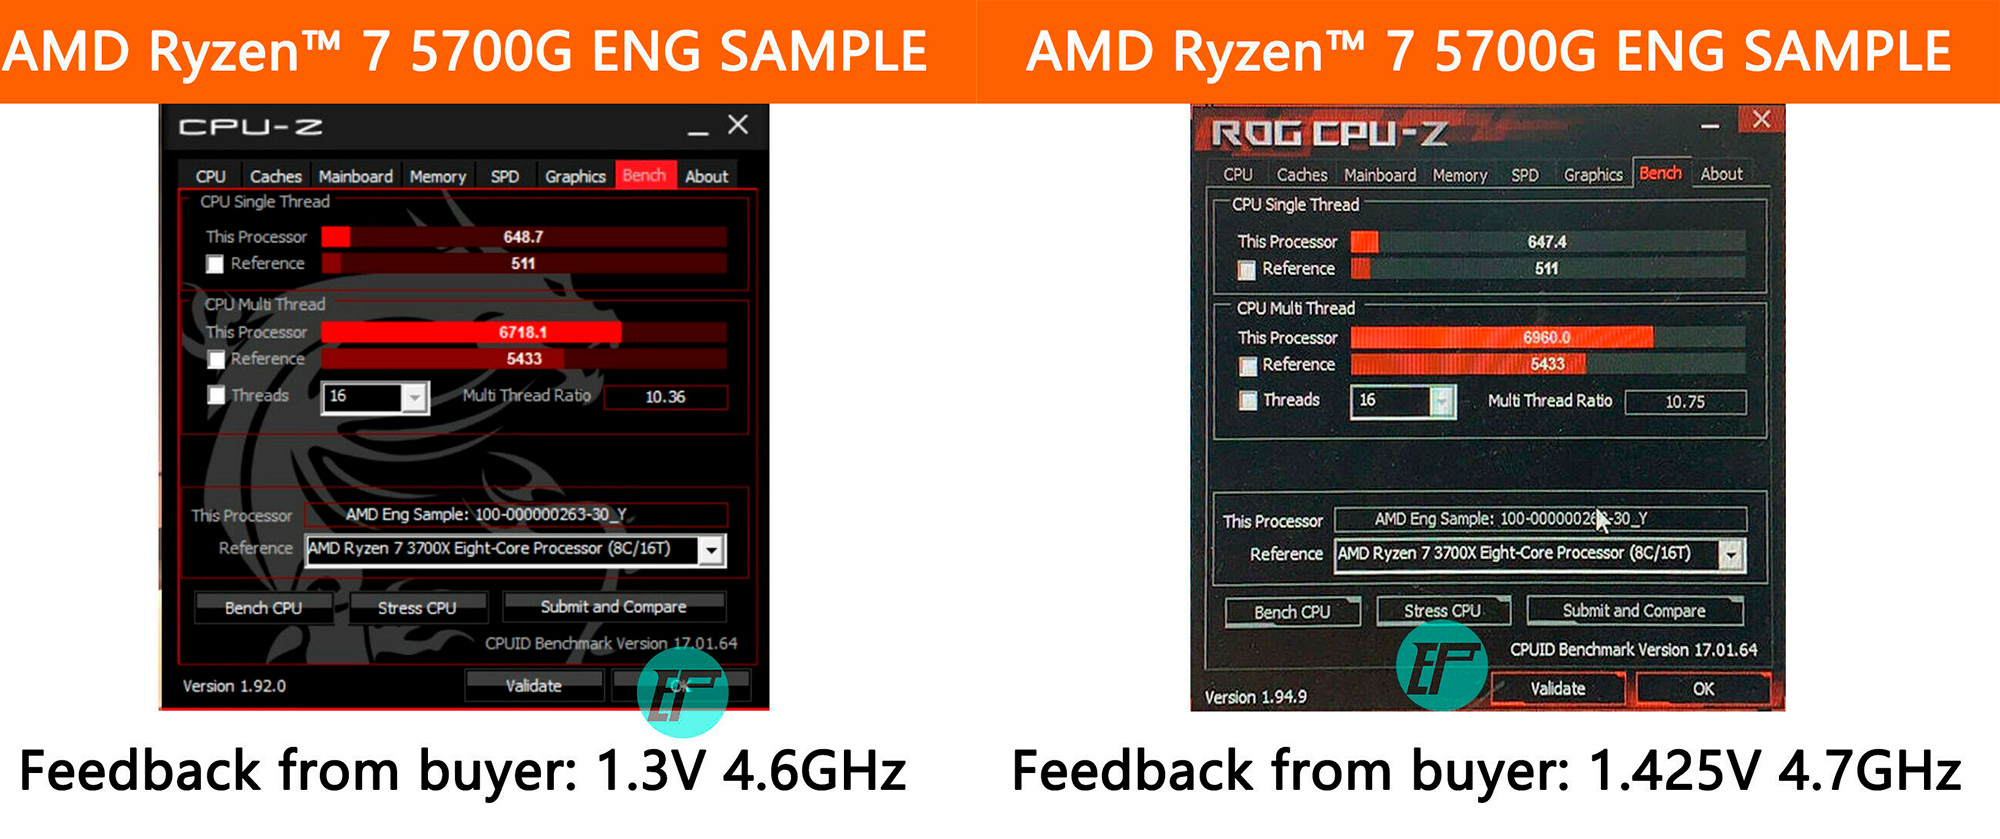 На eBay продаётся AMD Ryzen 7 5700G